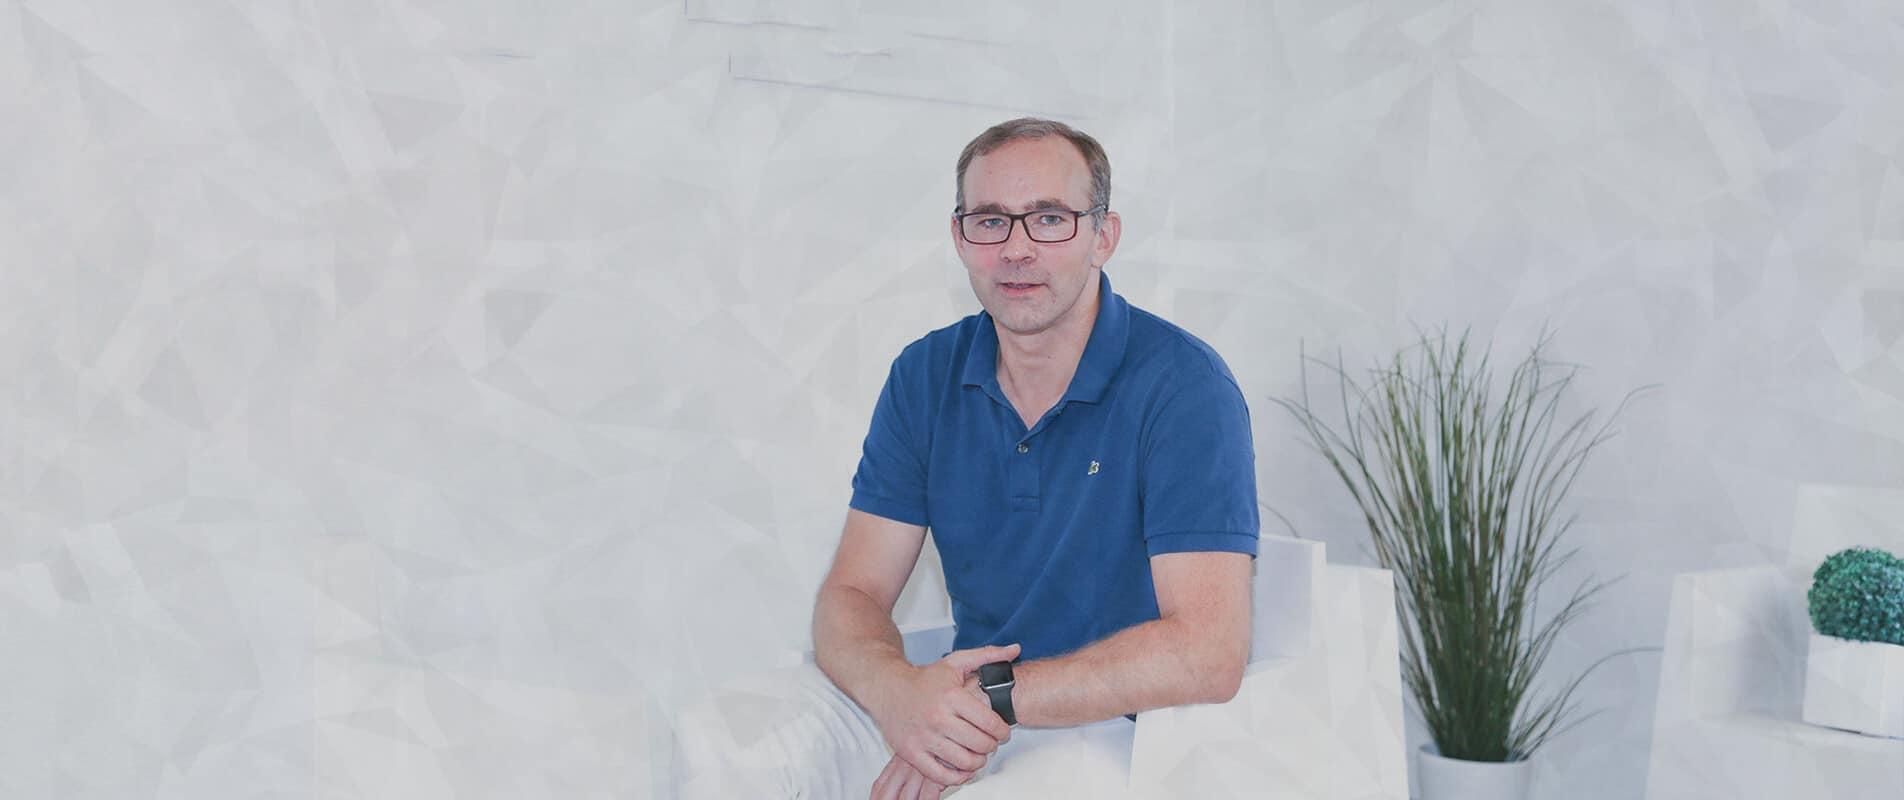 Dr-Bauckloh-Bochum-Dr-Bauckloh-slider